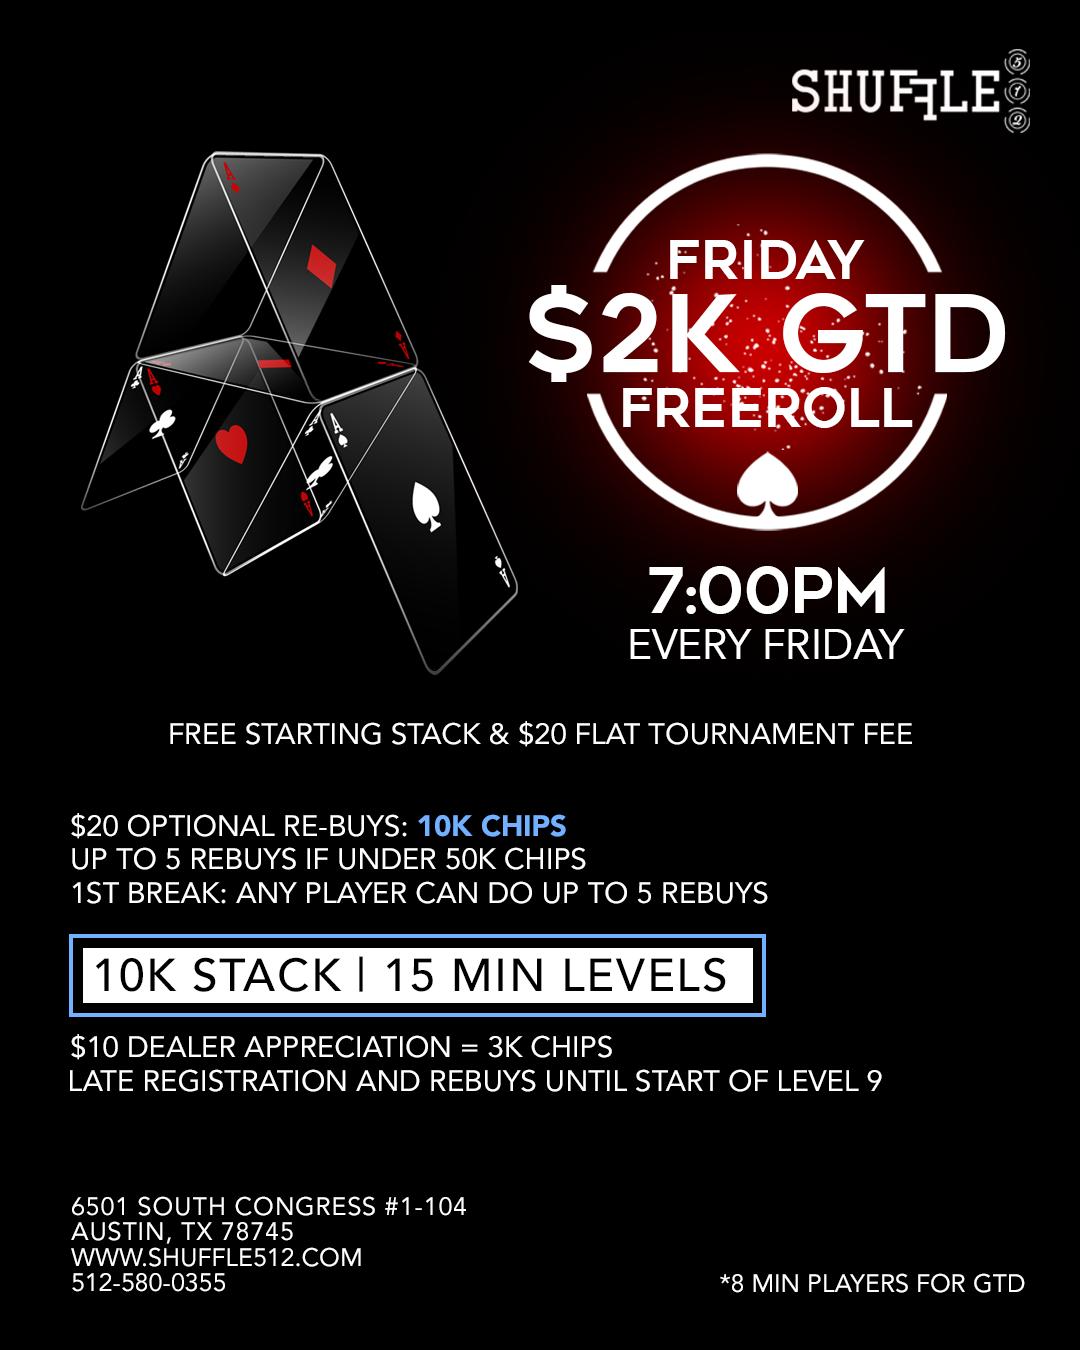 Shuffle 512 Friday 2K GTD Freeroll